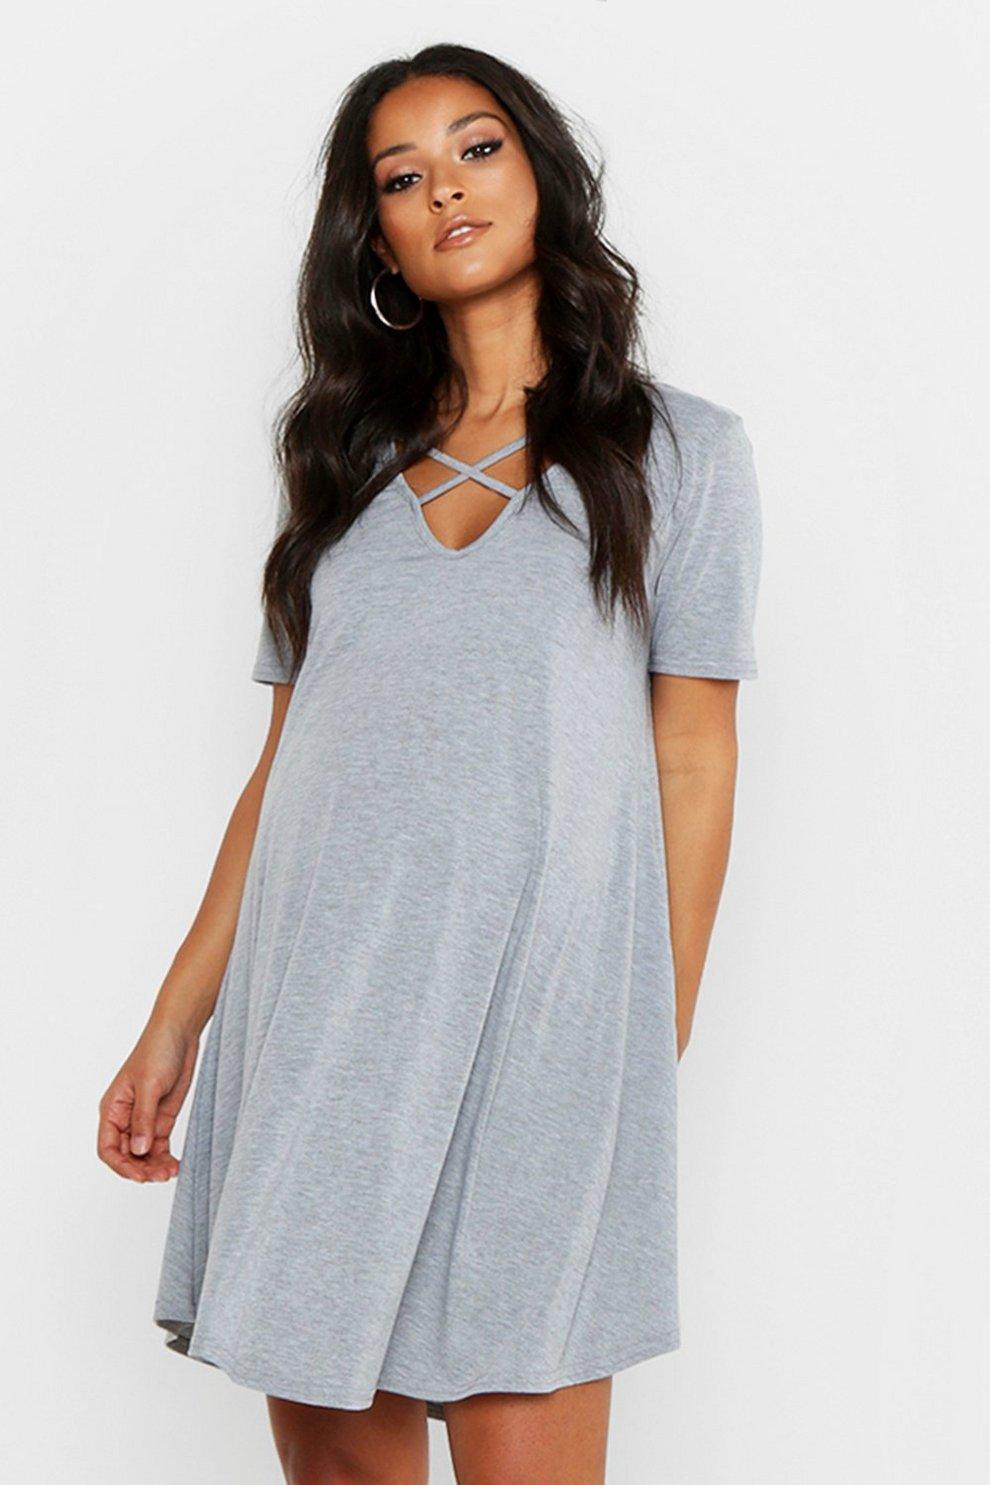 c61a1595e1d45 Maternity Cross Strap Short Sleeve Swing Dress | Boohoo